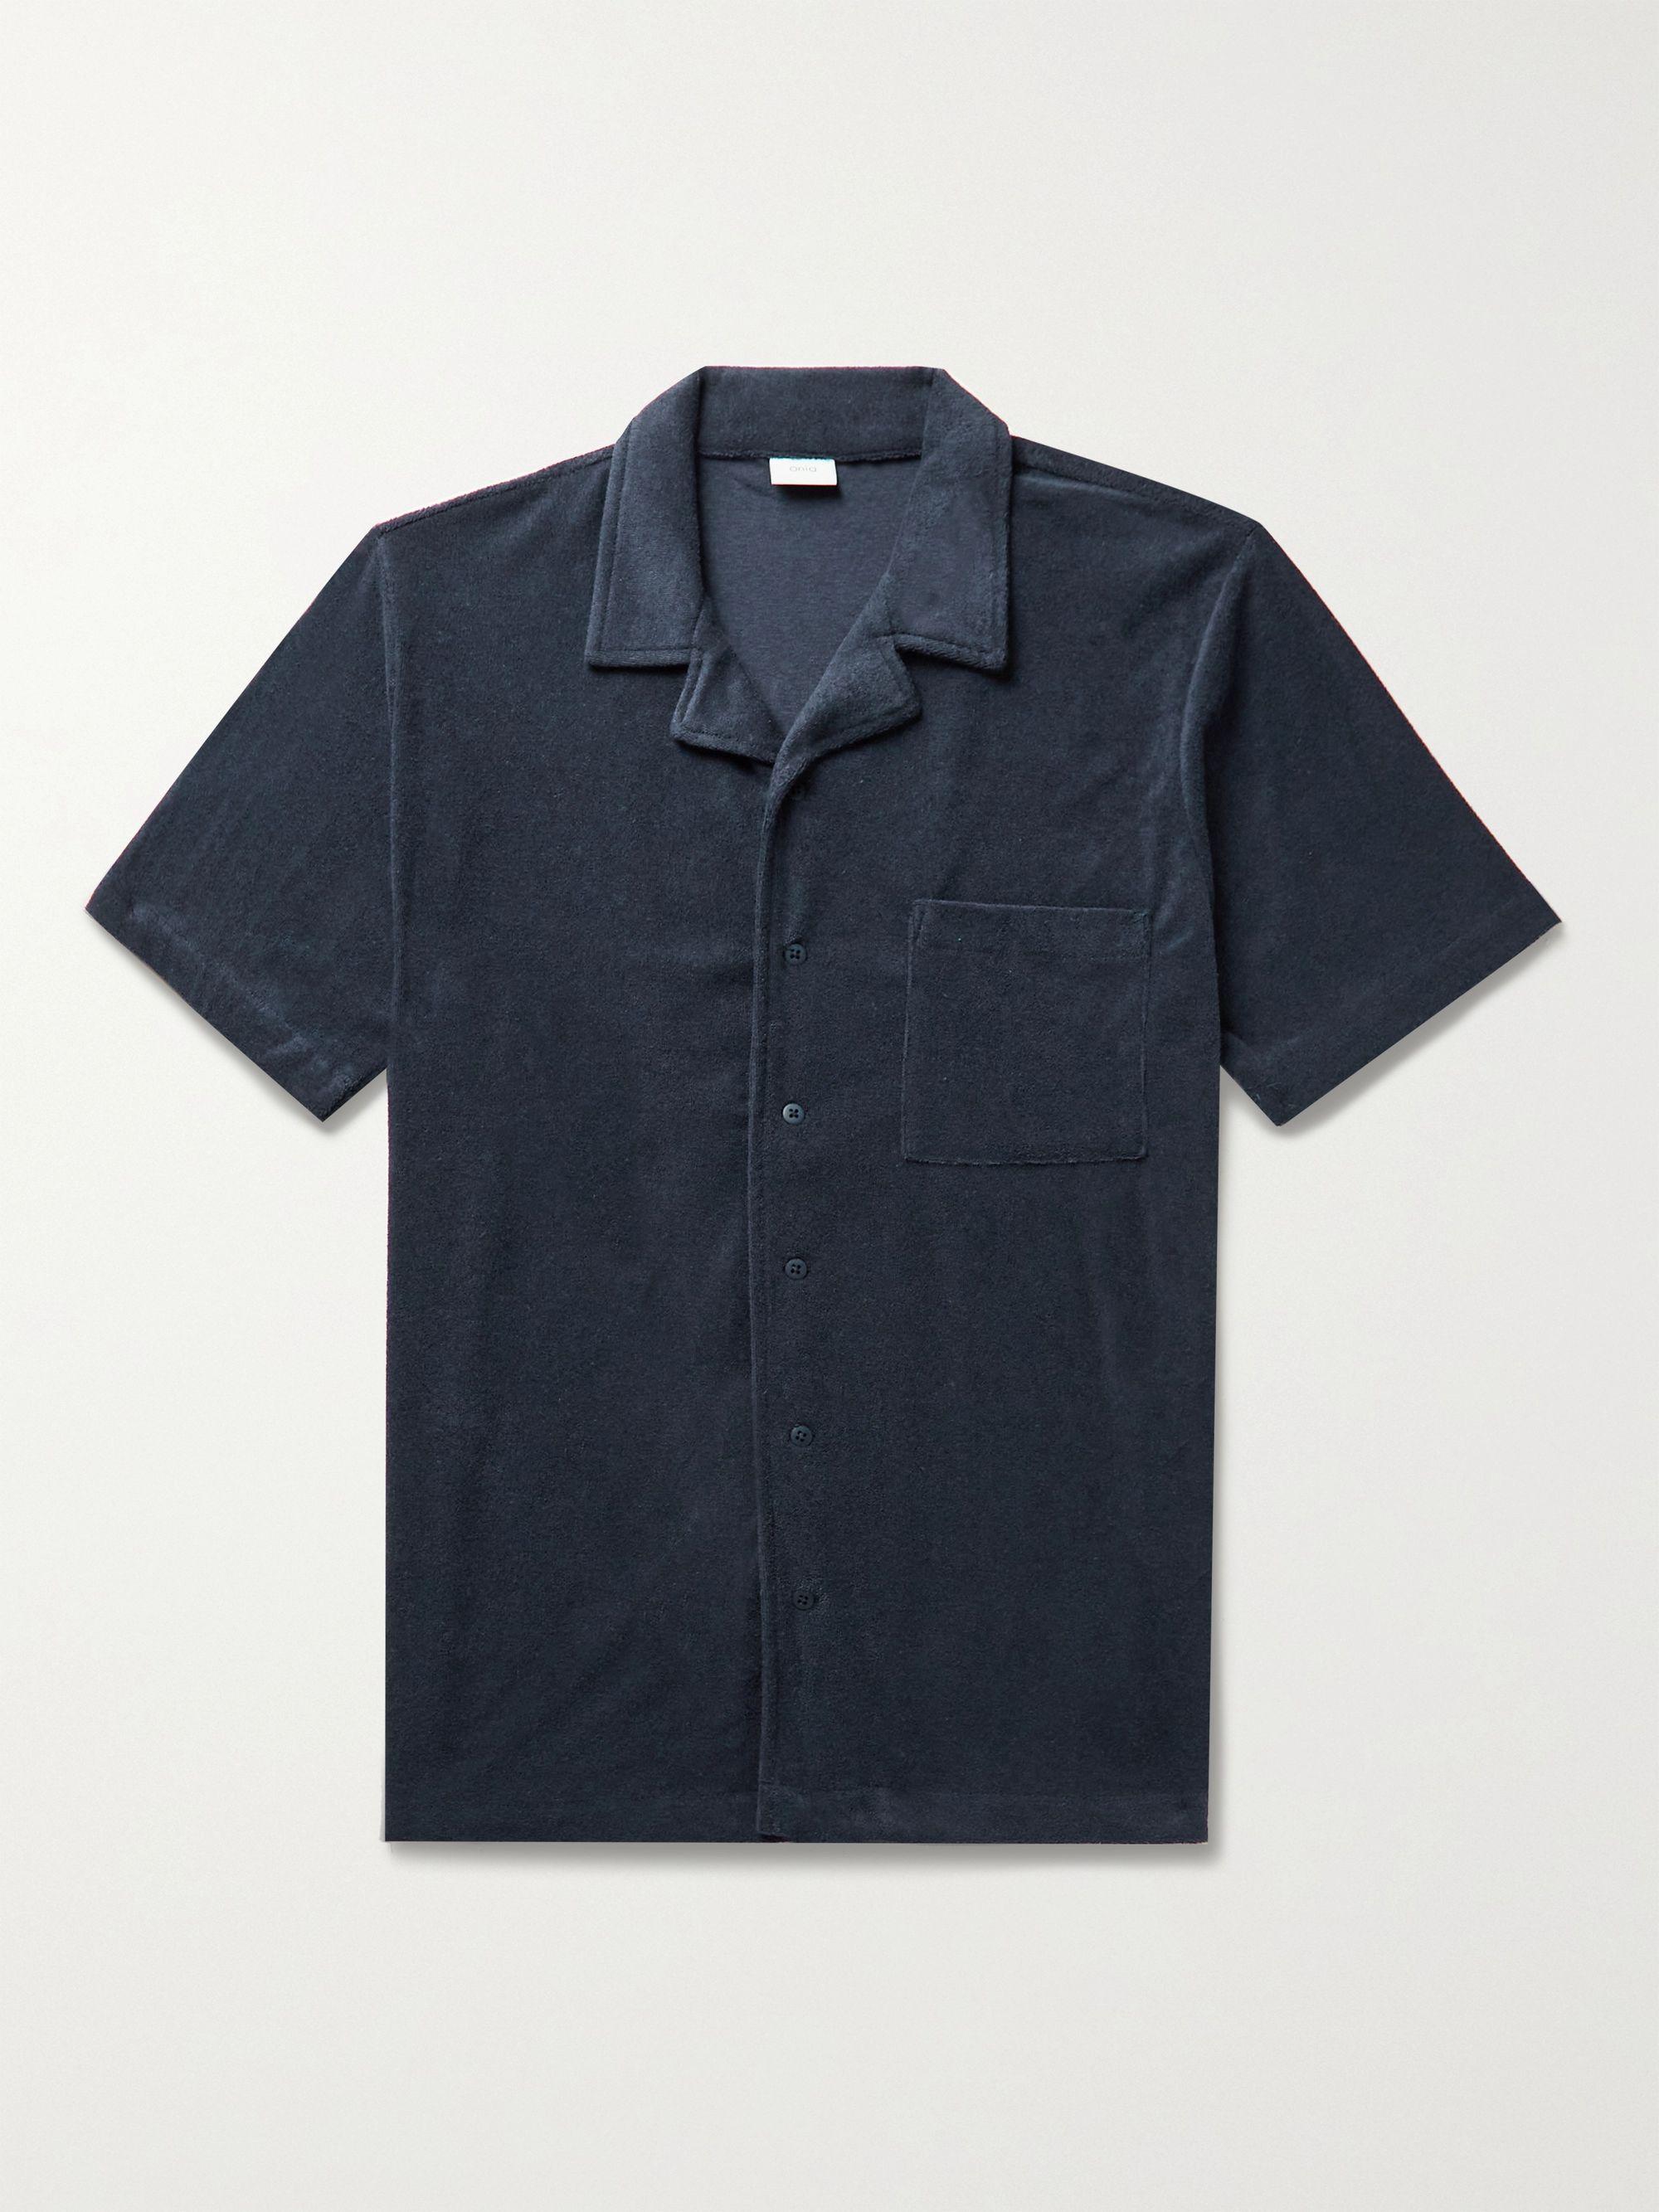 ONIA Camp-Collar Cotton-Blend Terry Shirt,Storm blue